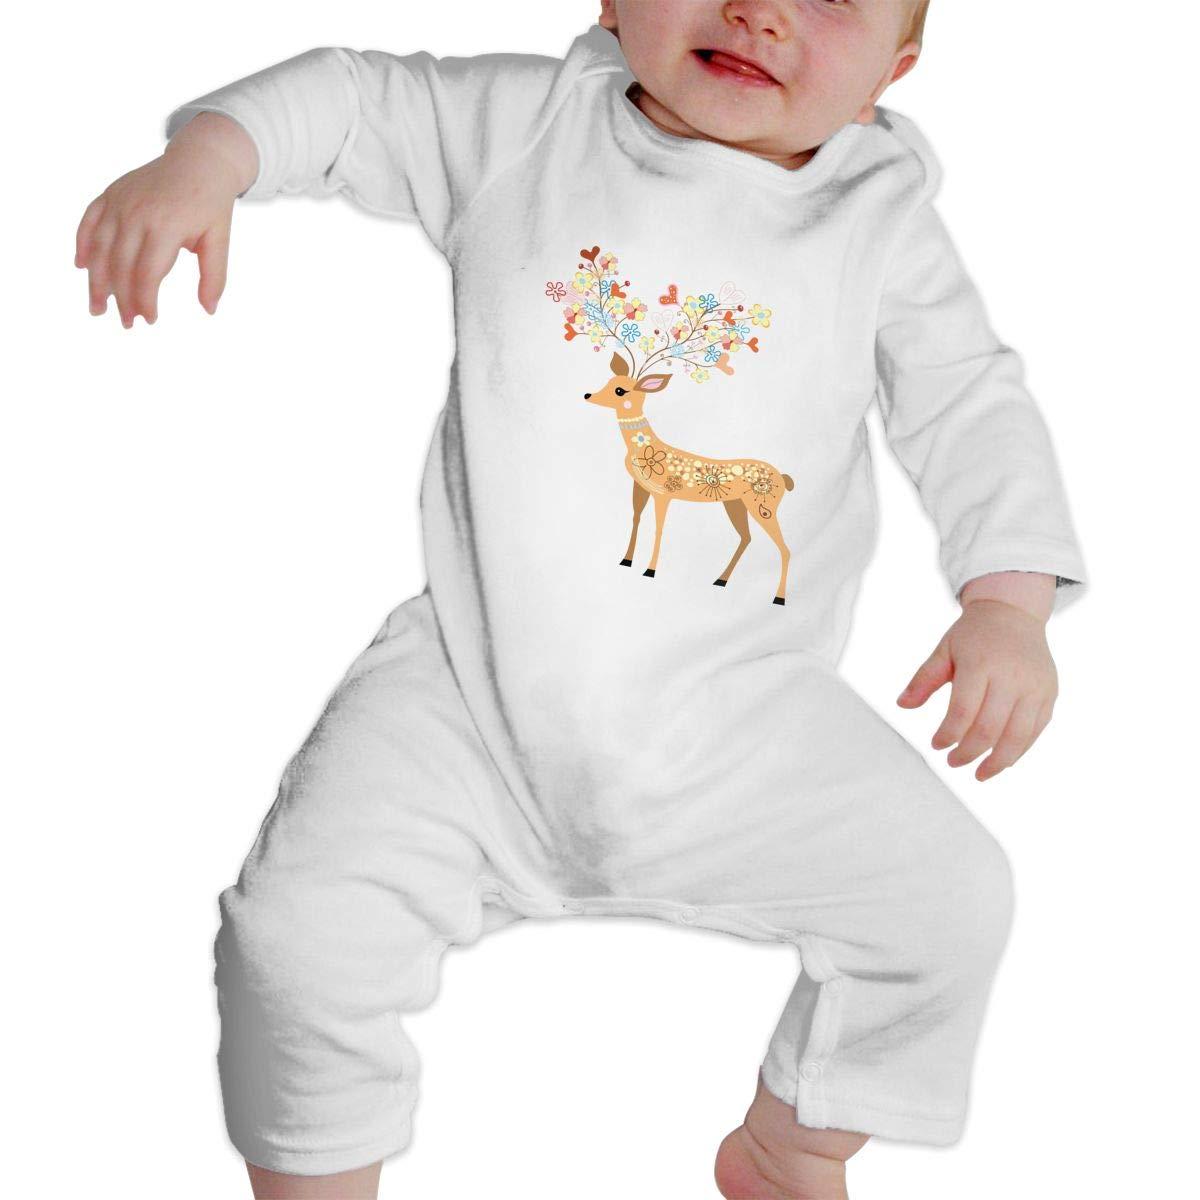 KAYERDELLE Cute Deer Long Sleeve Unisex Baby Romper for 6-24 Months Infant